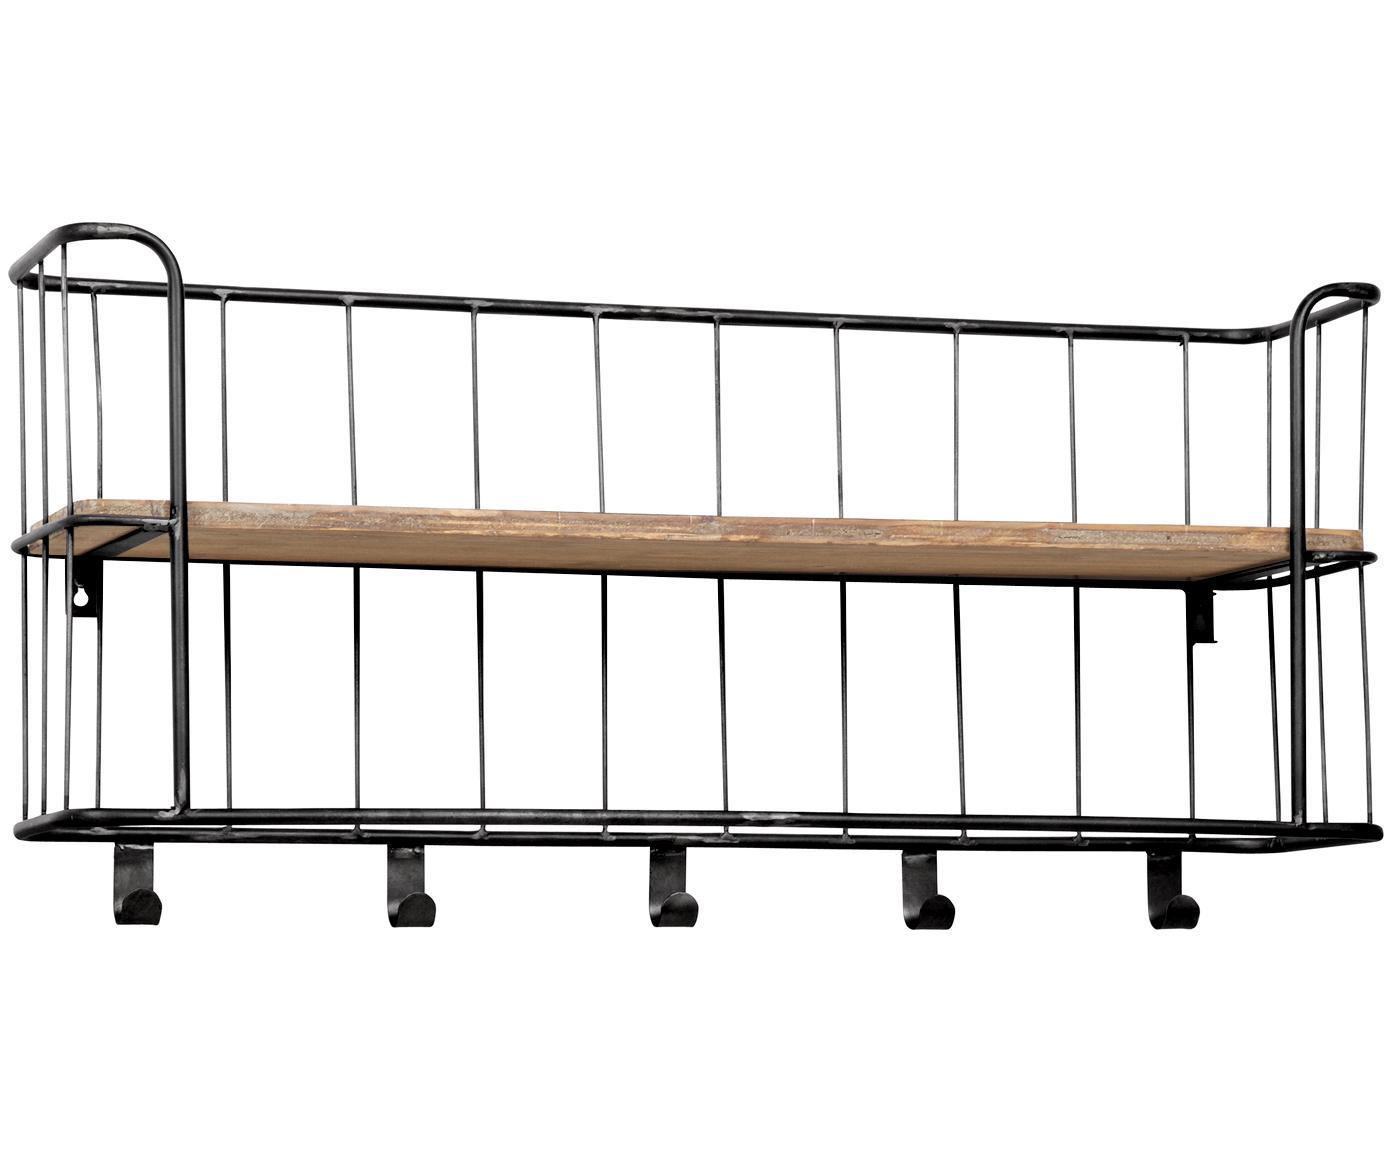 Perchero de pared Giro, estilo rústico, Estructura: metal, cromado, Estante: madera de mango, Cromo, madera de mango, An 85 x Al 40 cm